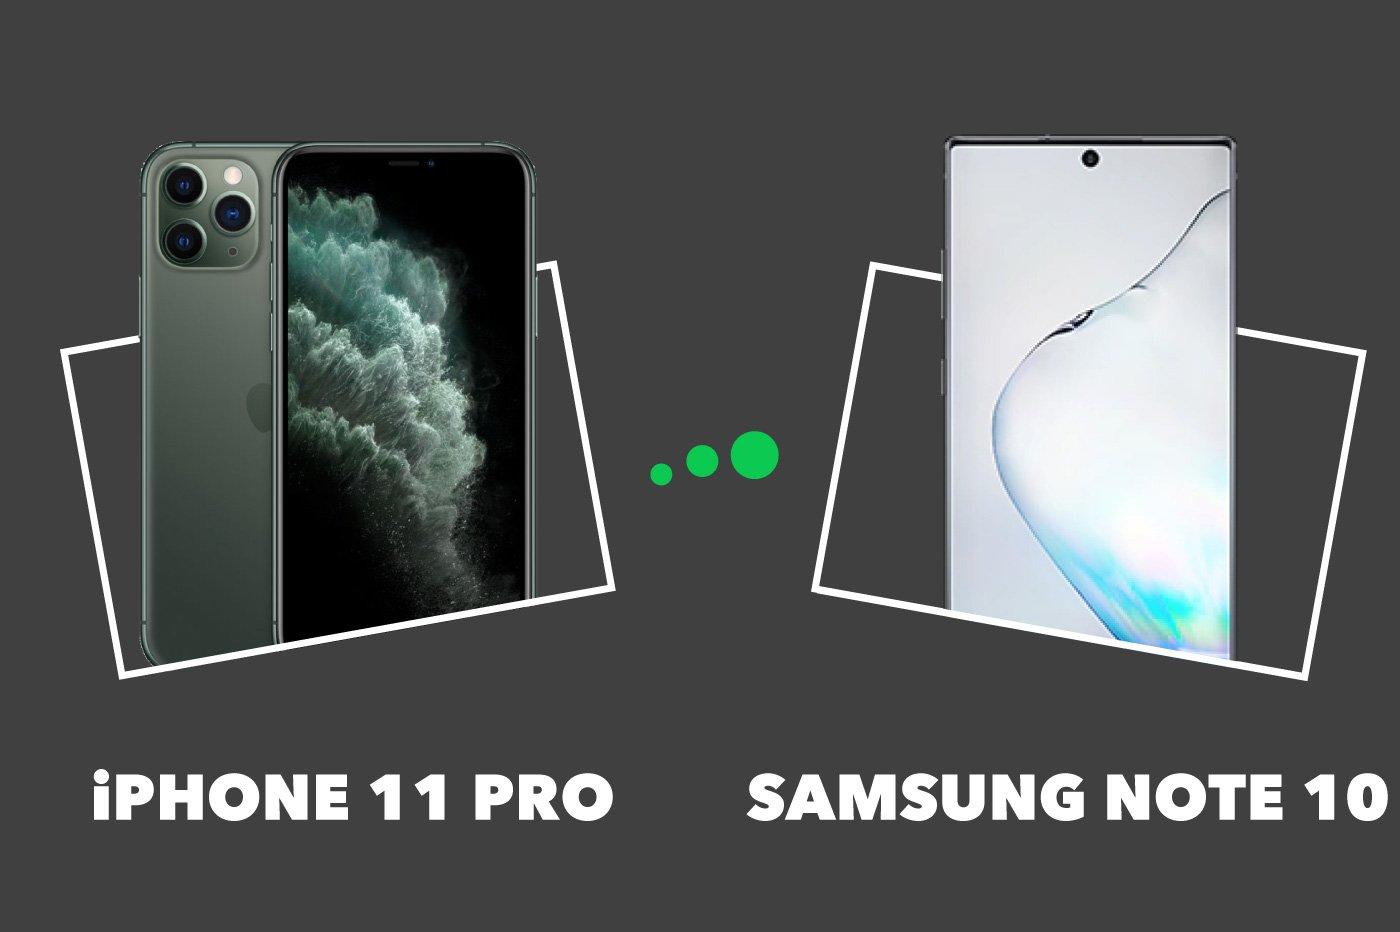 iPhone 11 Pro vs Samsung Note 10